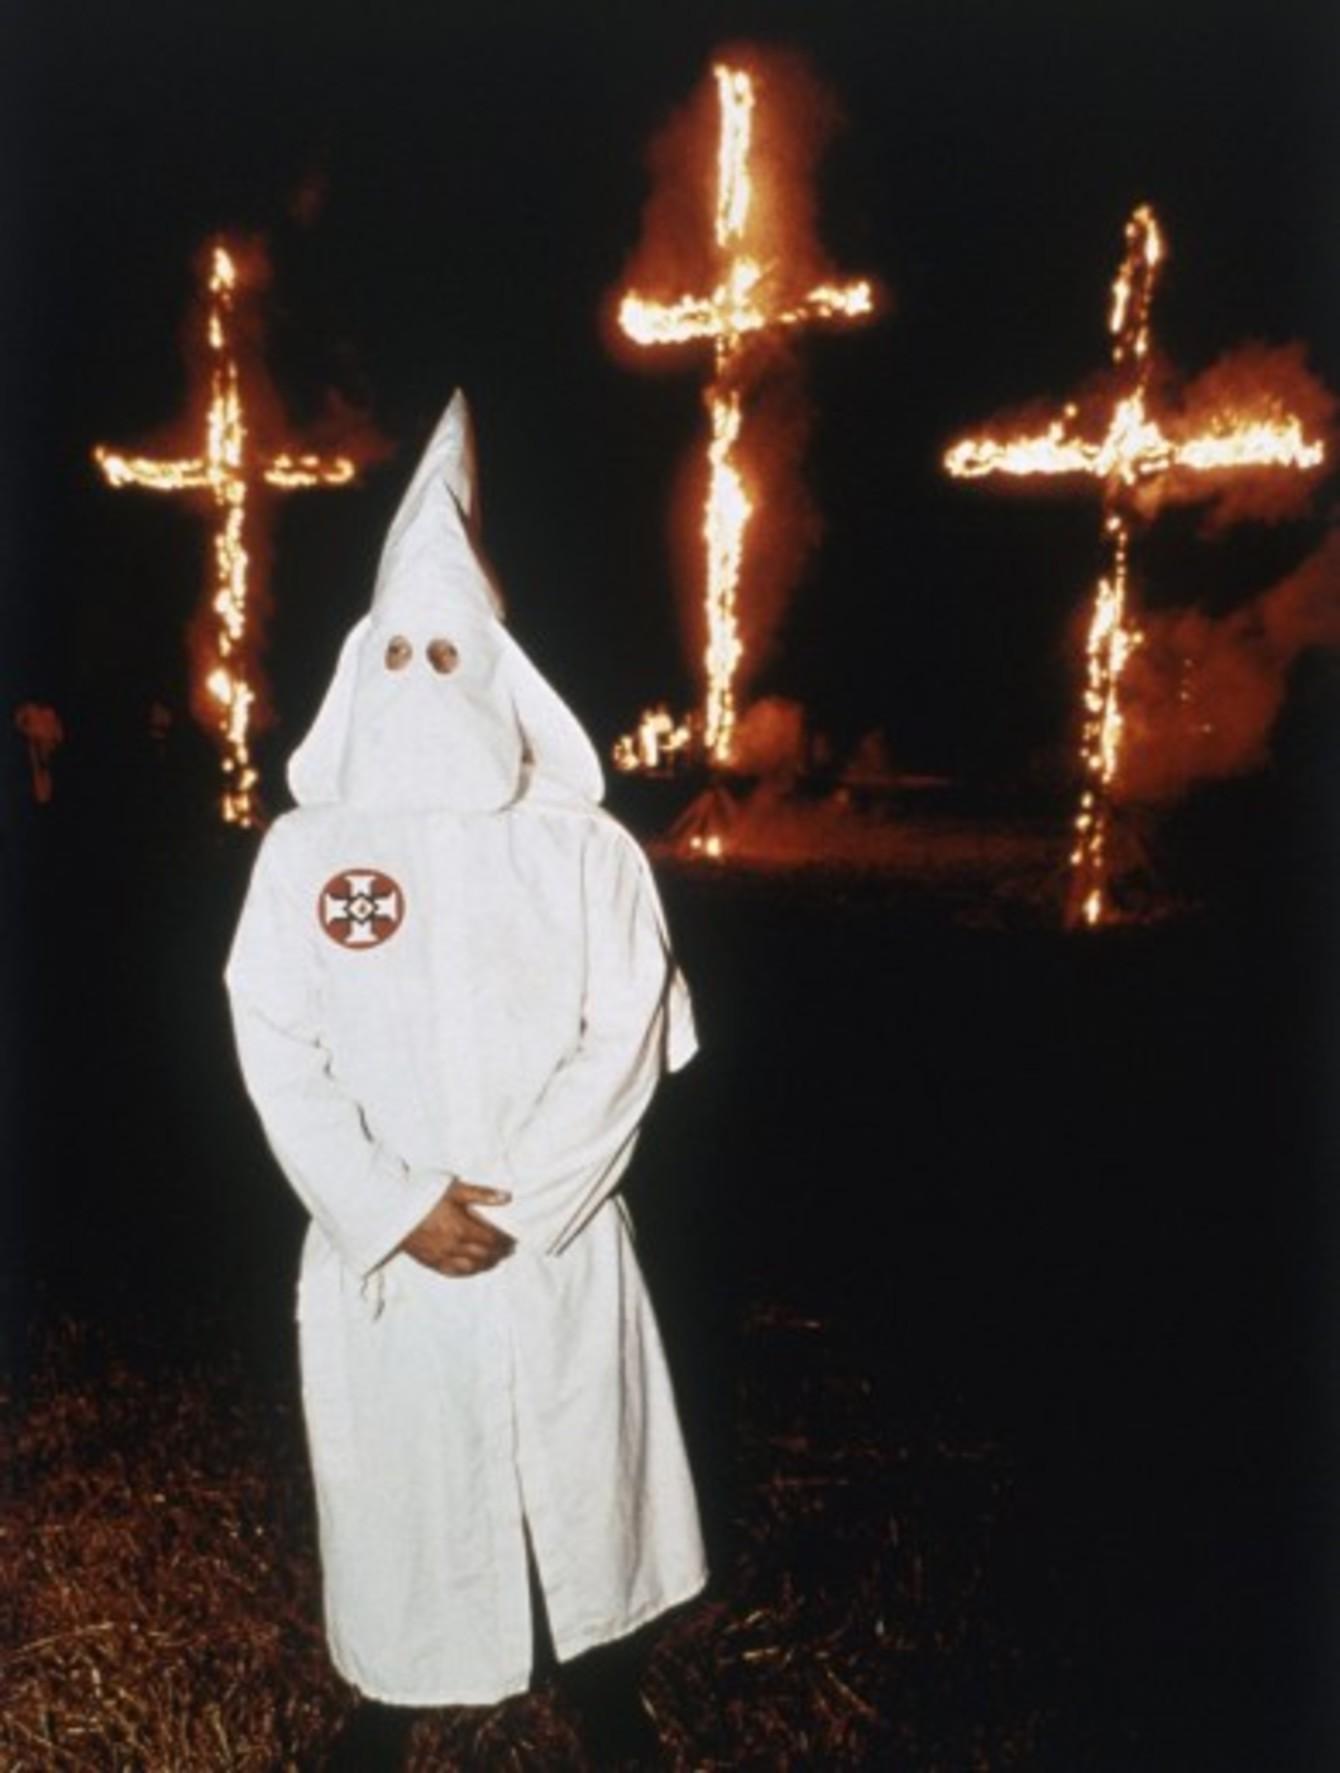 Ku Klux Klan · TheJournal.ie